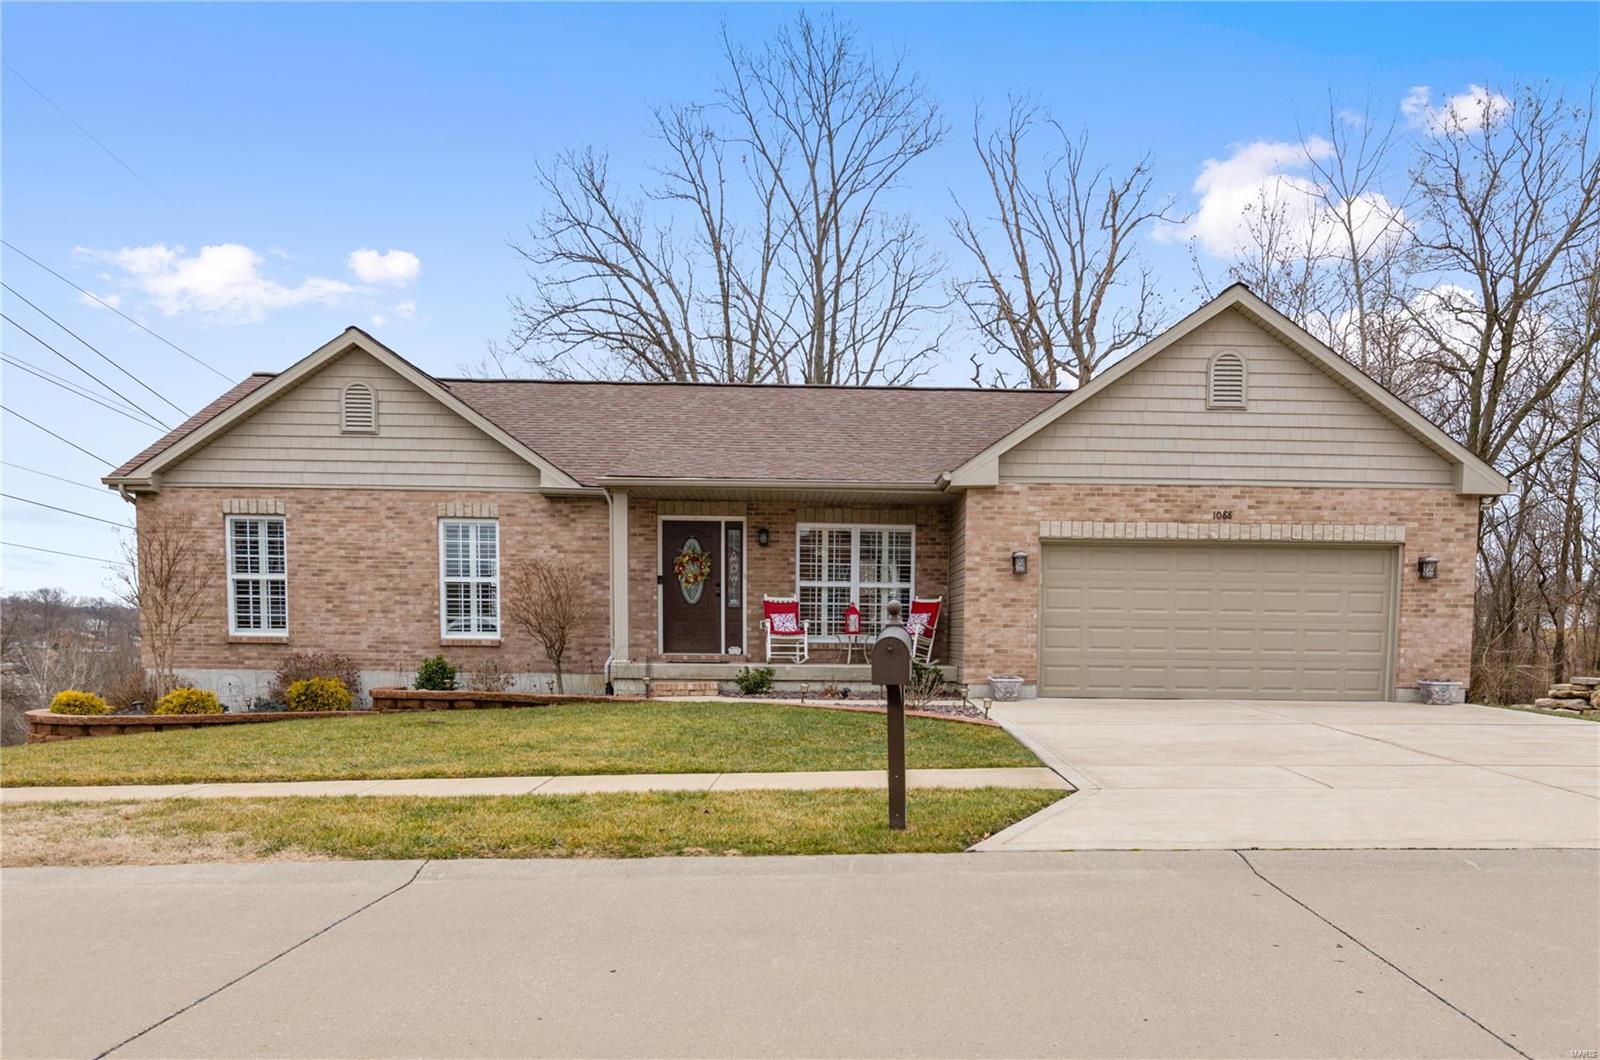 1088 Hickory Ridge Trail Property Photo - Arnold, MO real estate listing